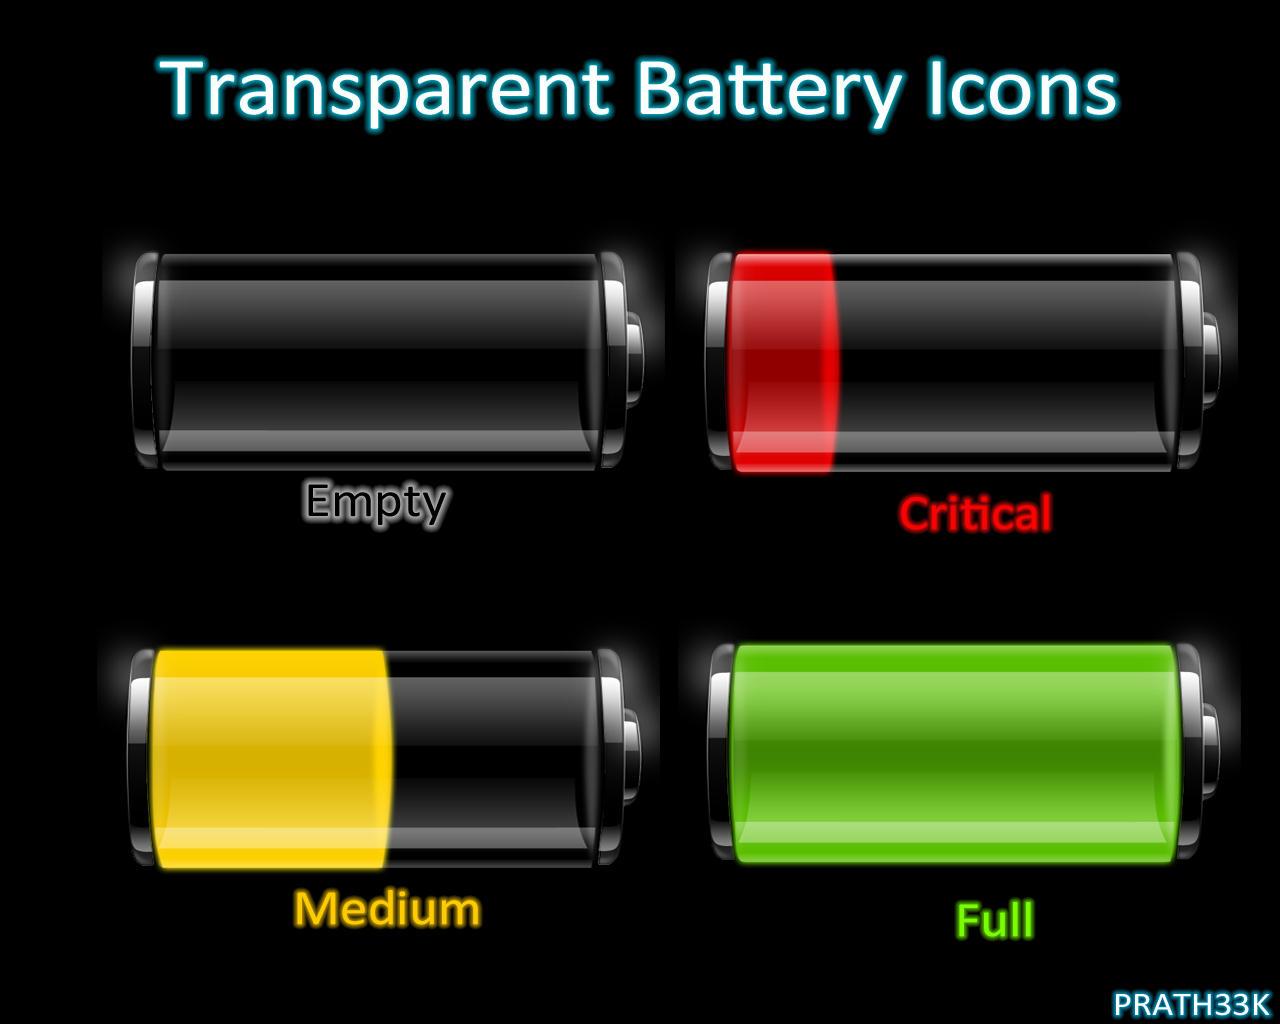 Transparent Battery Icons by PRATH33K